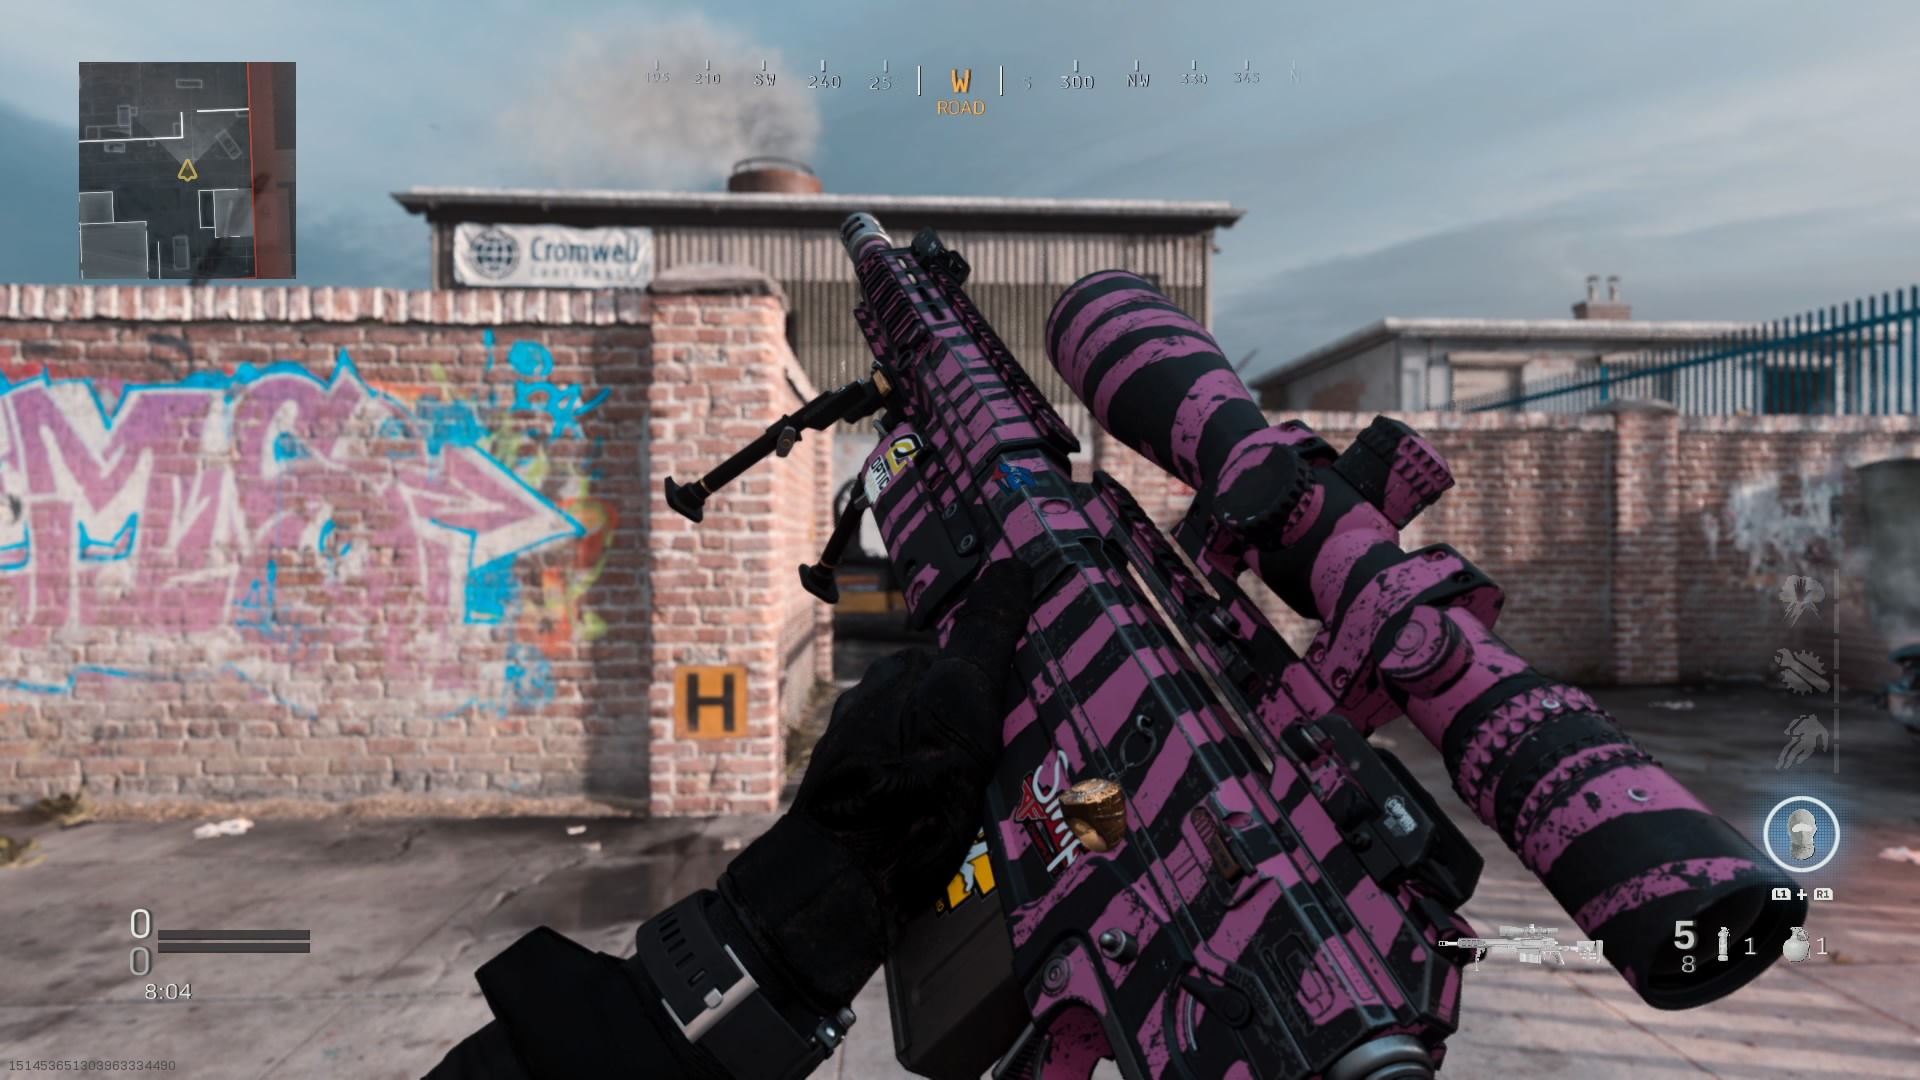 Modern Warfare AX-50 weapon inspect